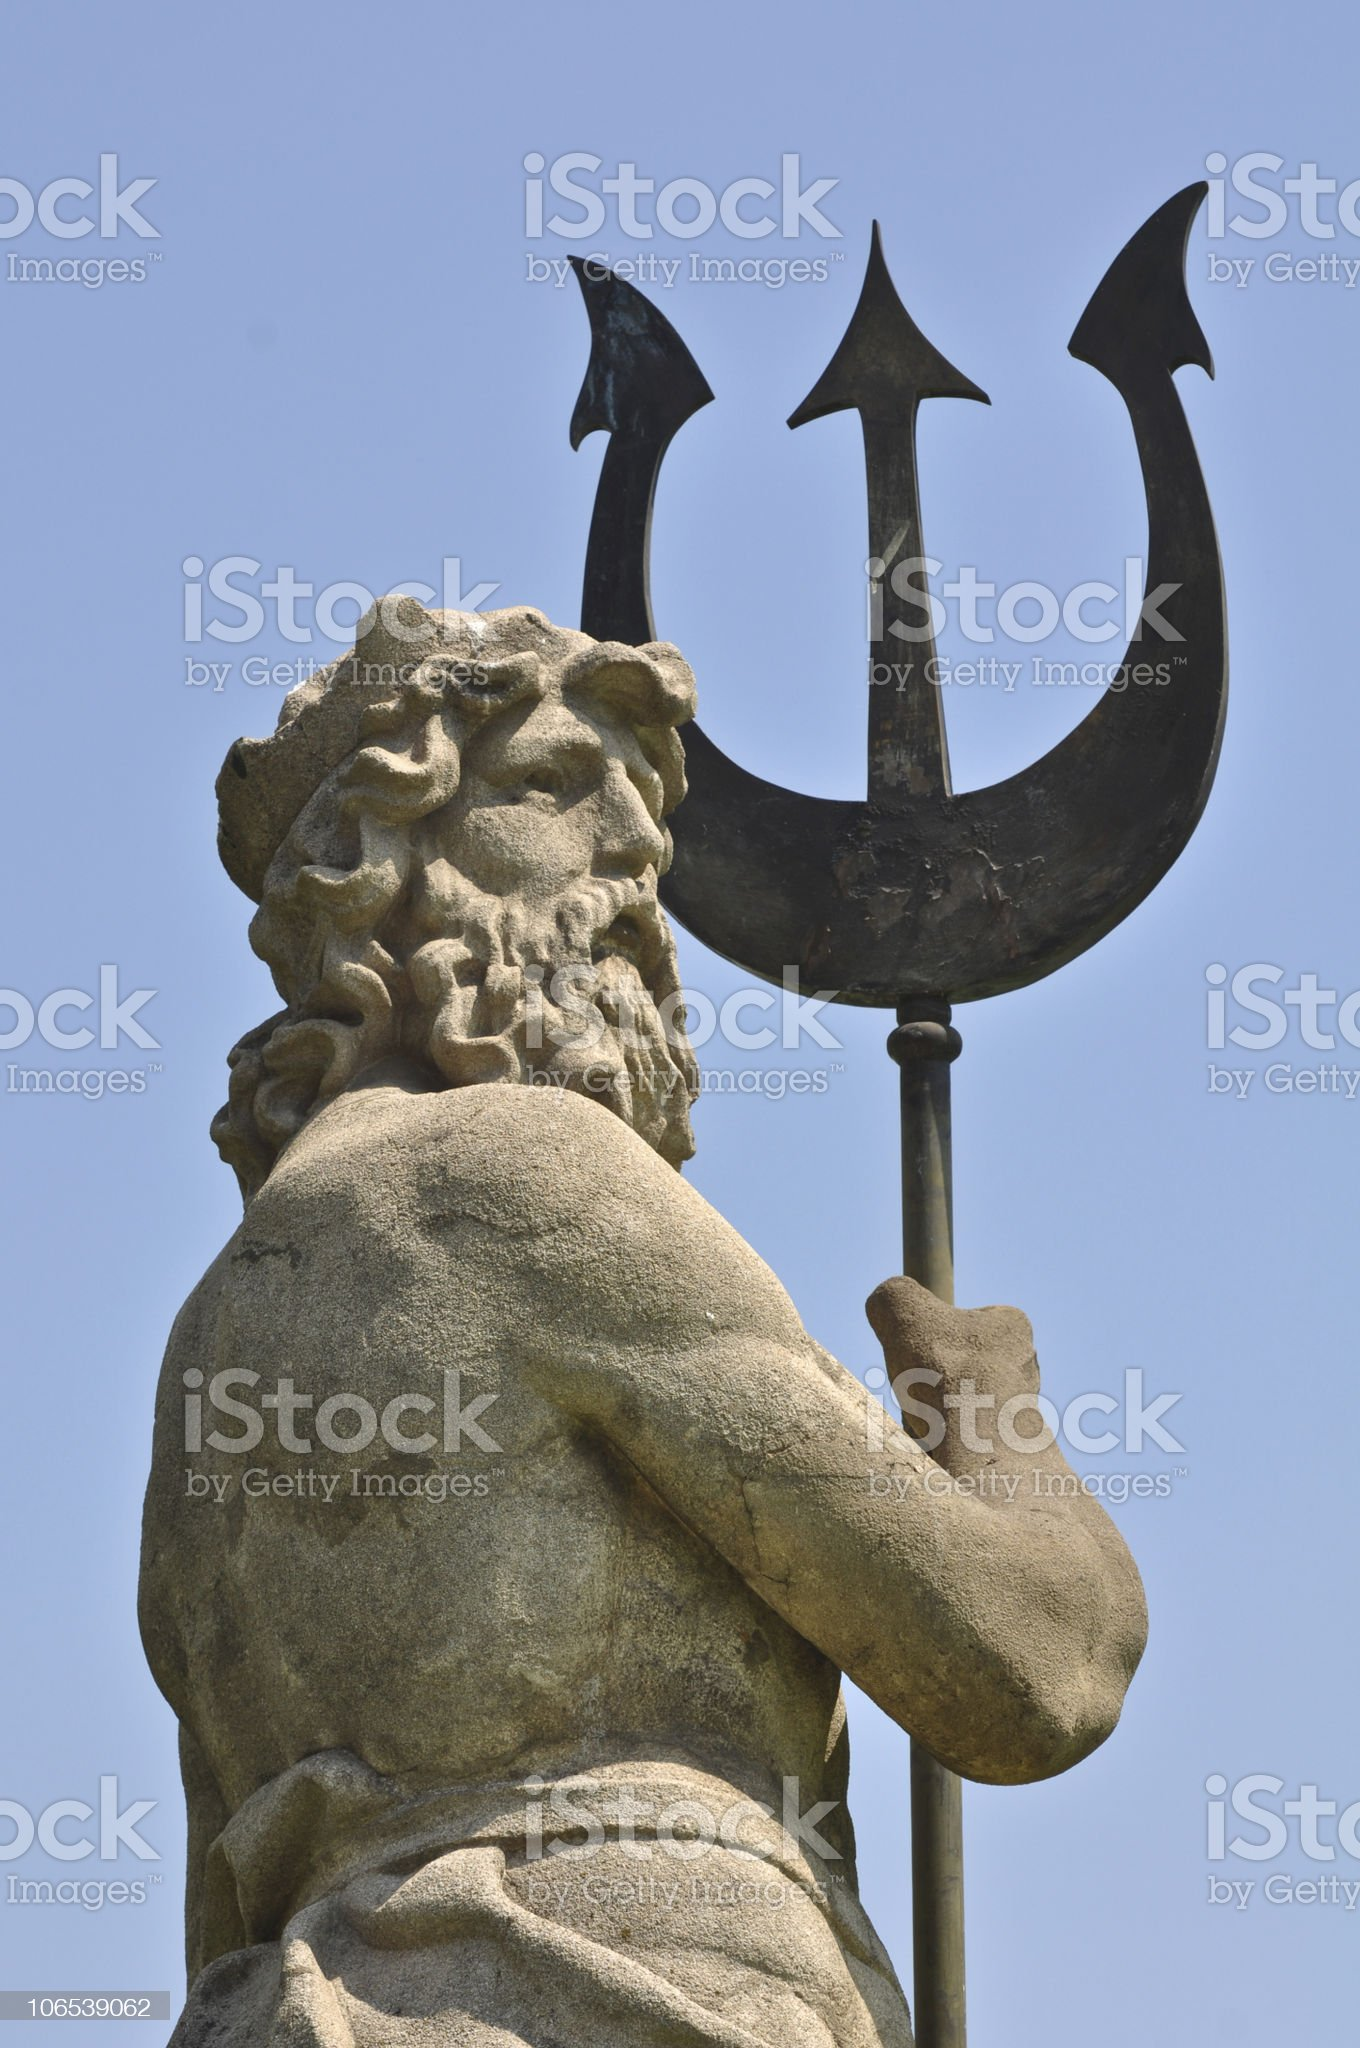 Posideon Neptune with Triton Statue royalty-free stock photo